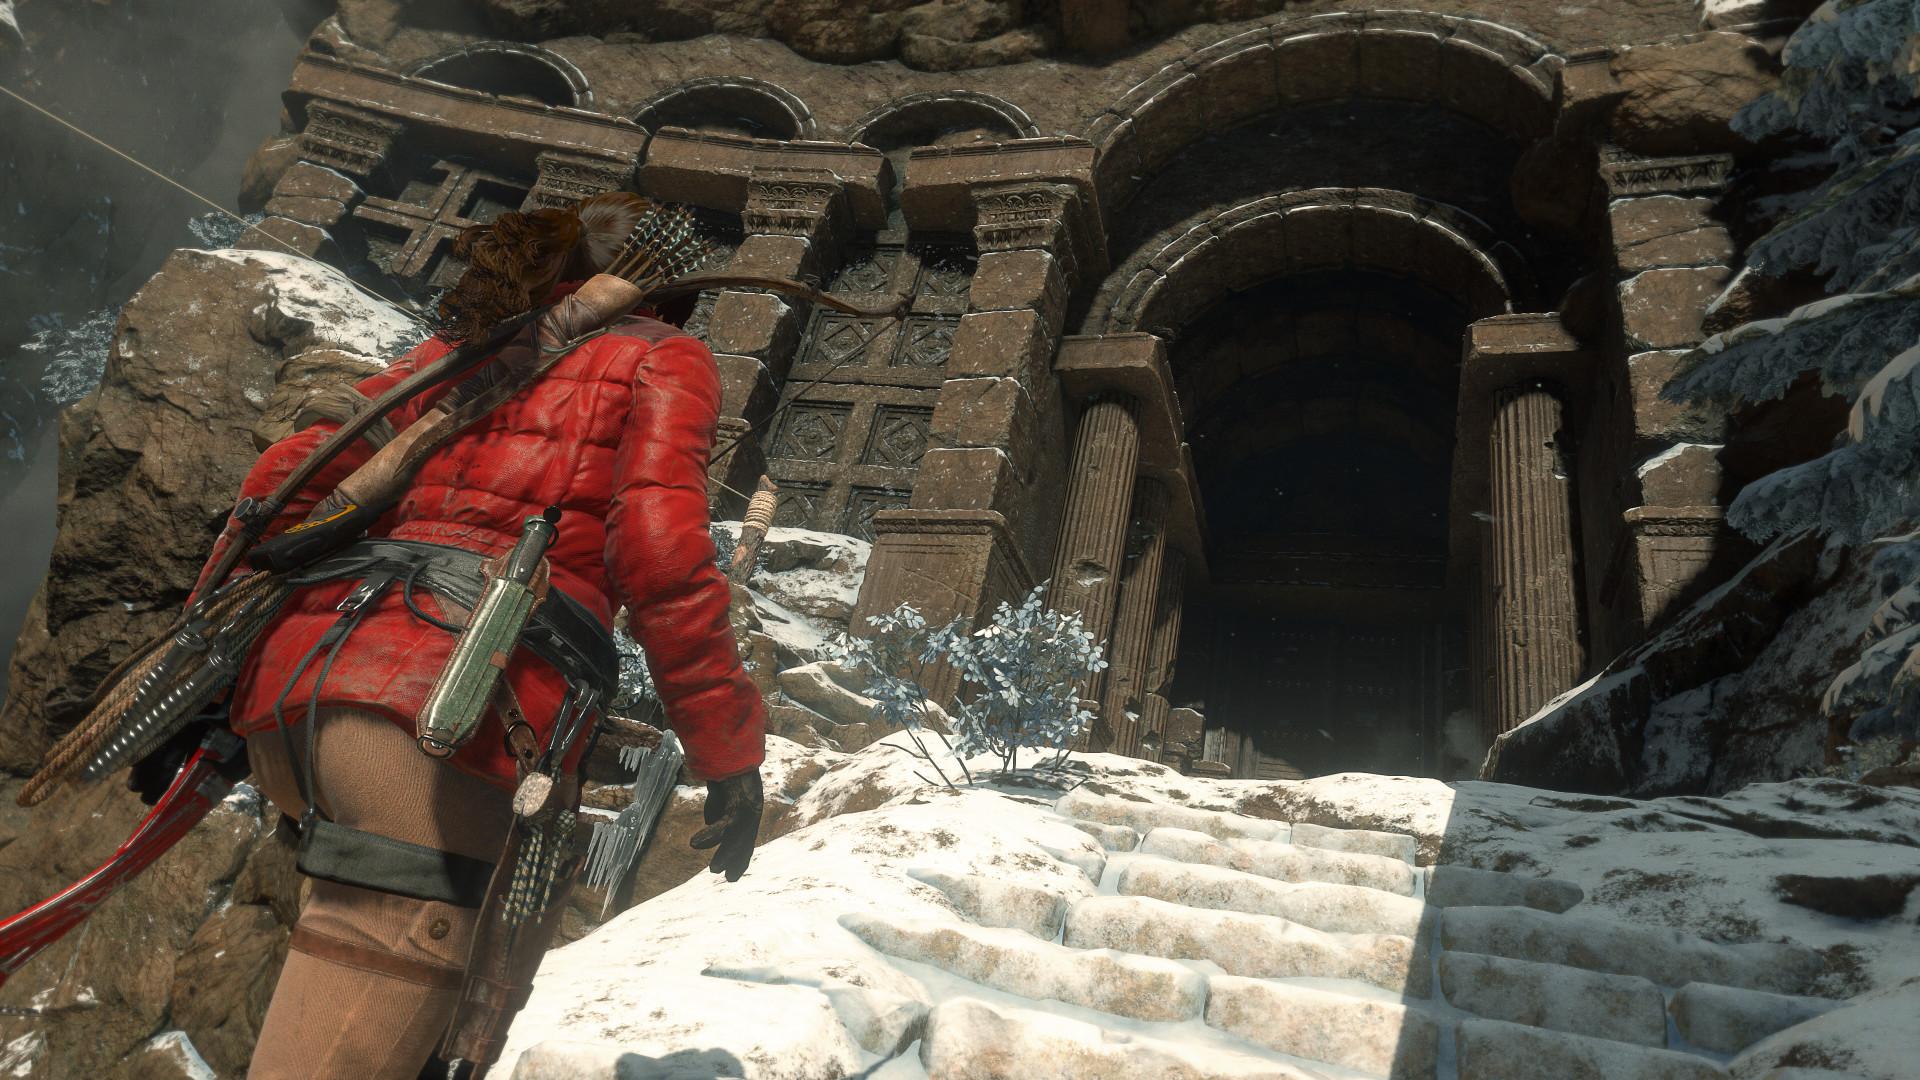 Rise of the Tomb Raider Screenshot 1